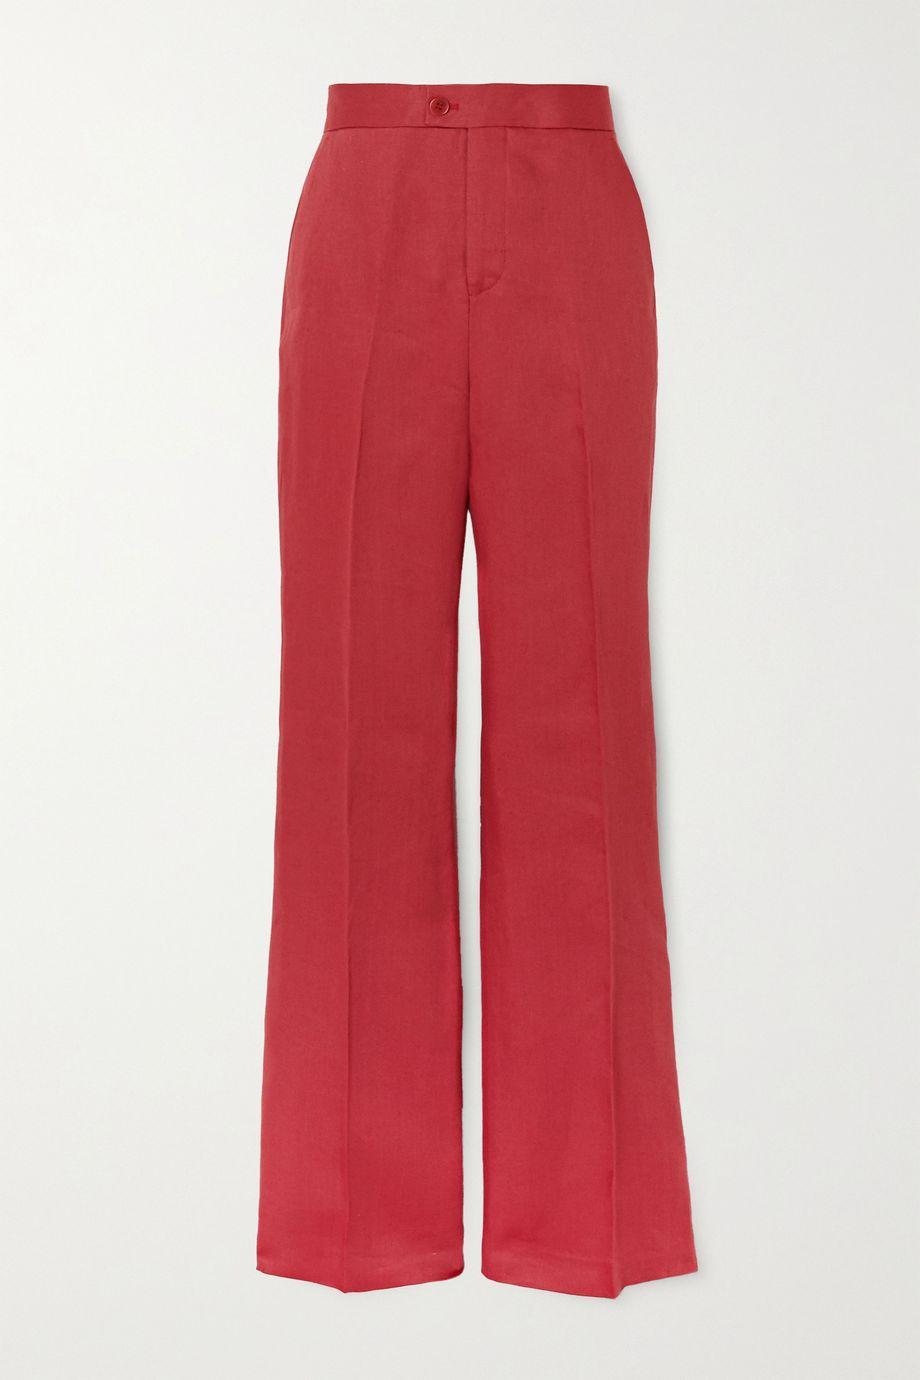 Altuzarra Higbie linen straight-leg pants